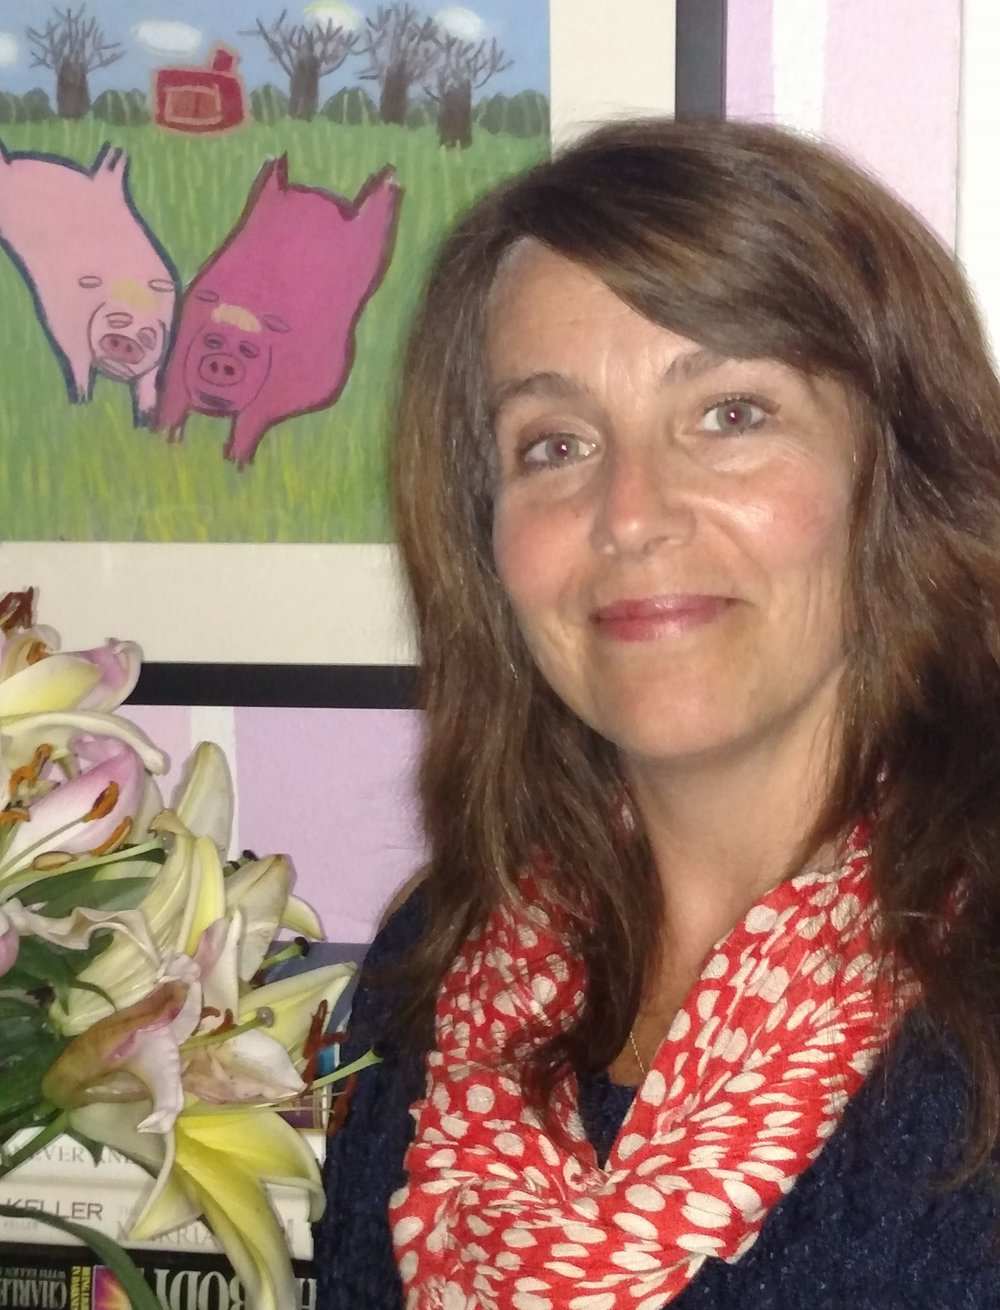 Kristen Hern - Advocate Manager serving Amherst, Nelson, & Lynchburg